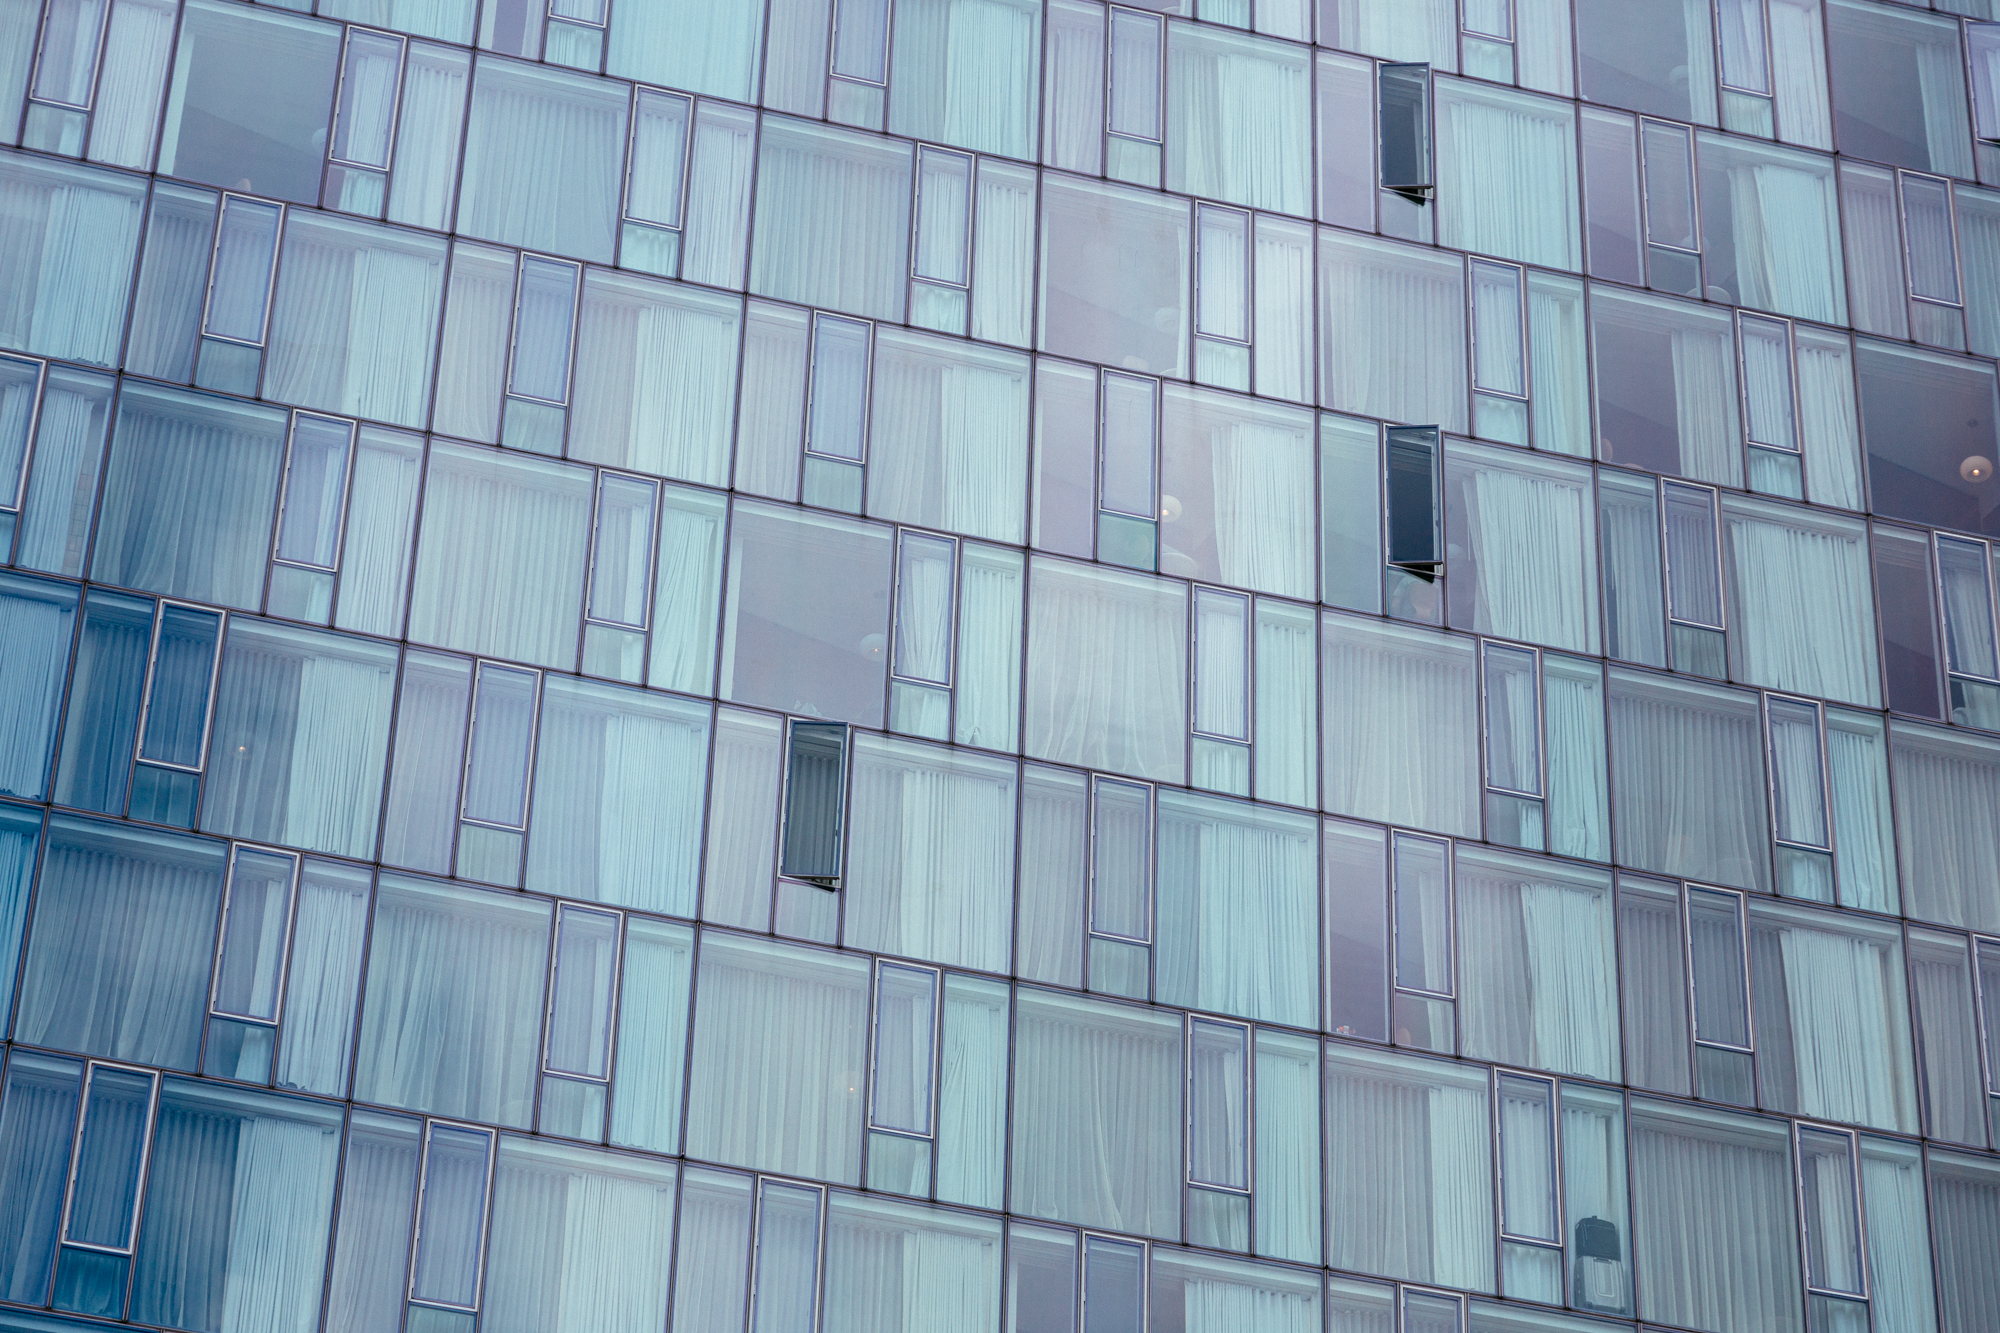 New York City Slanted Windows